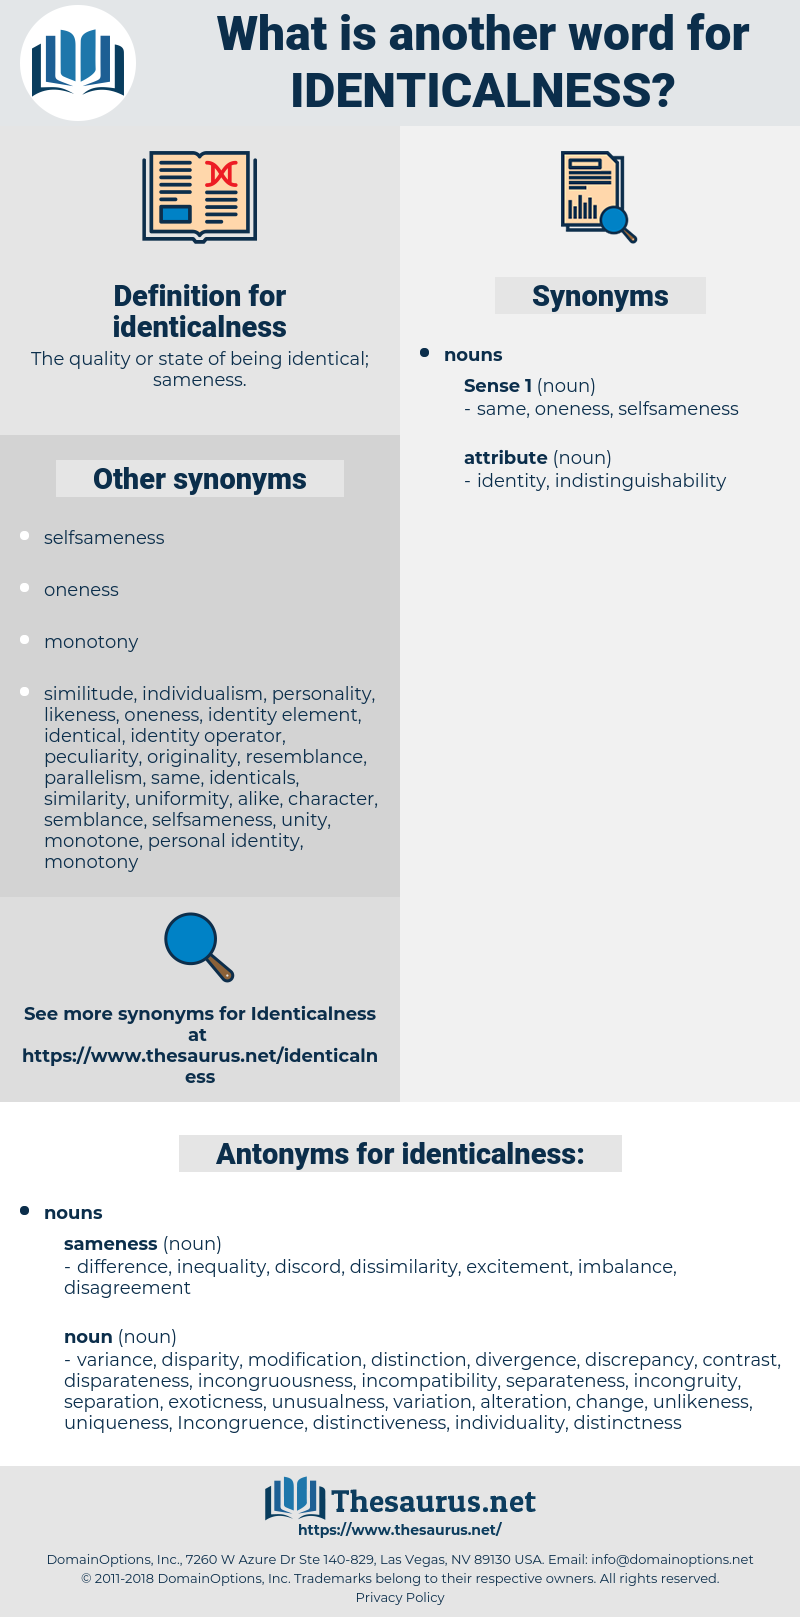 identicalness, synonym identicalness, another word for identicalness, words like identicalness, thesaurus identicalness